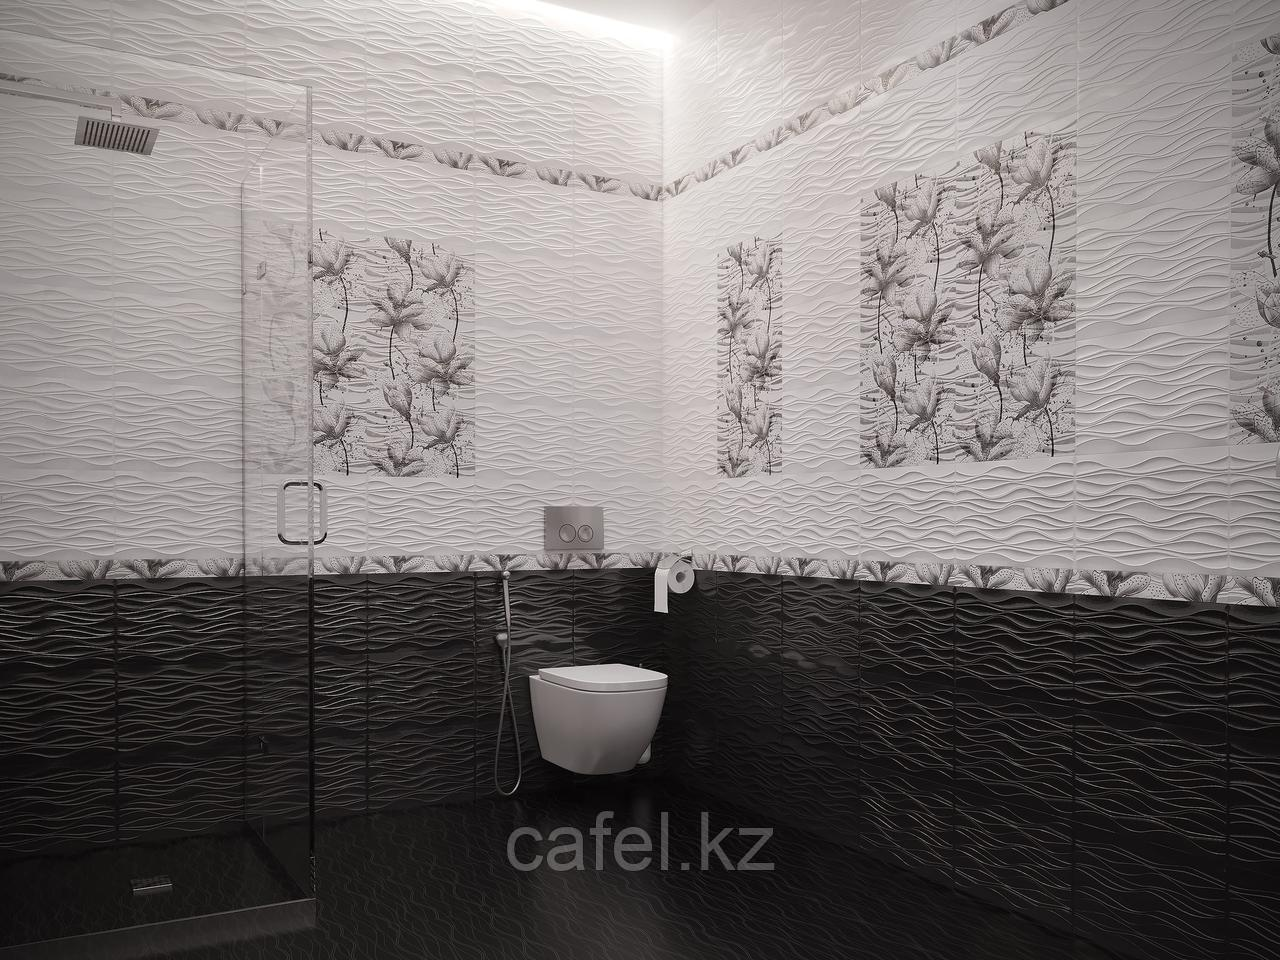 Кафель | Плитка настенная 28х40 Селеста | Selesta